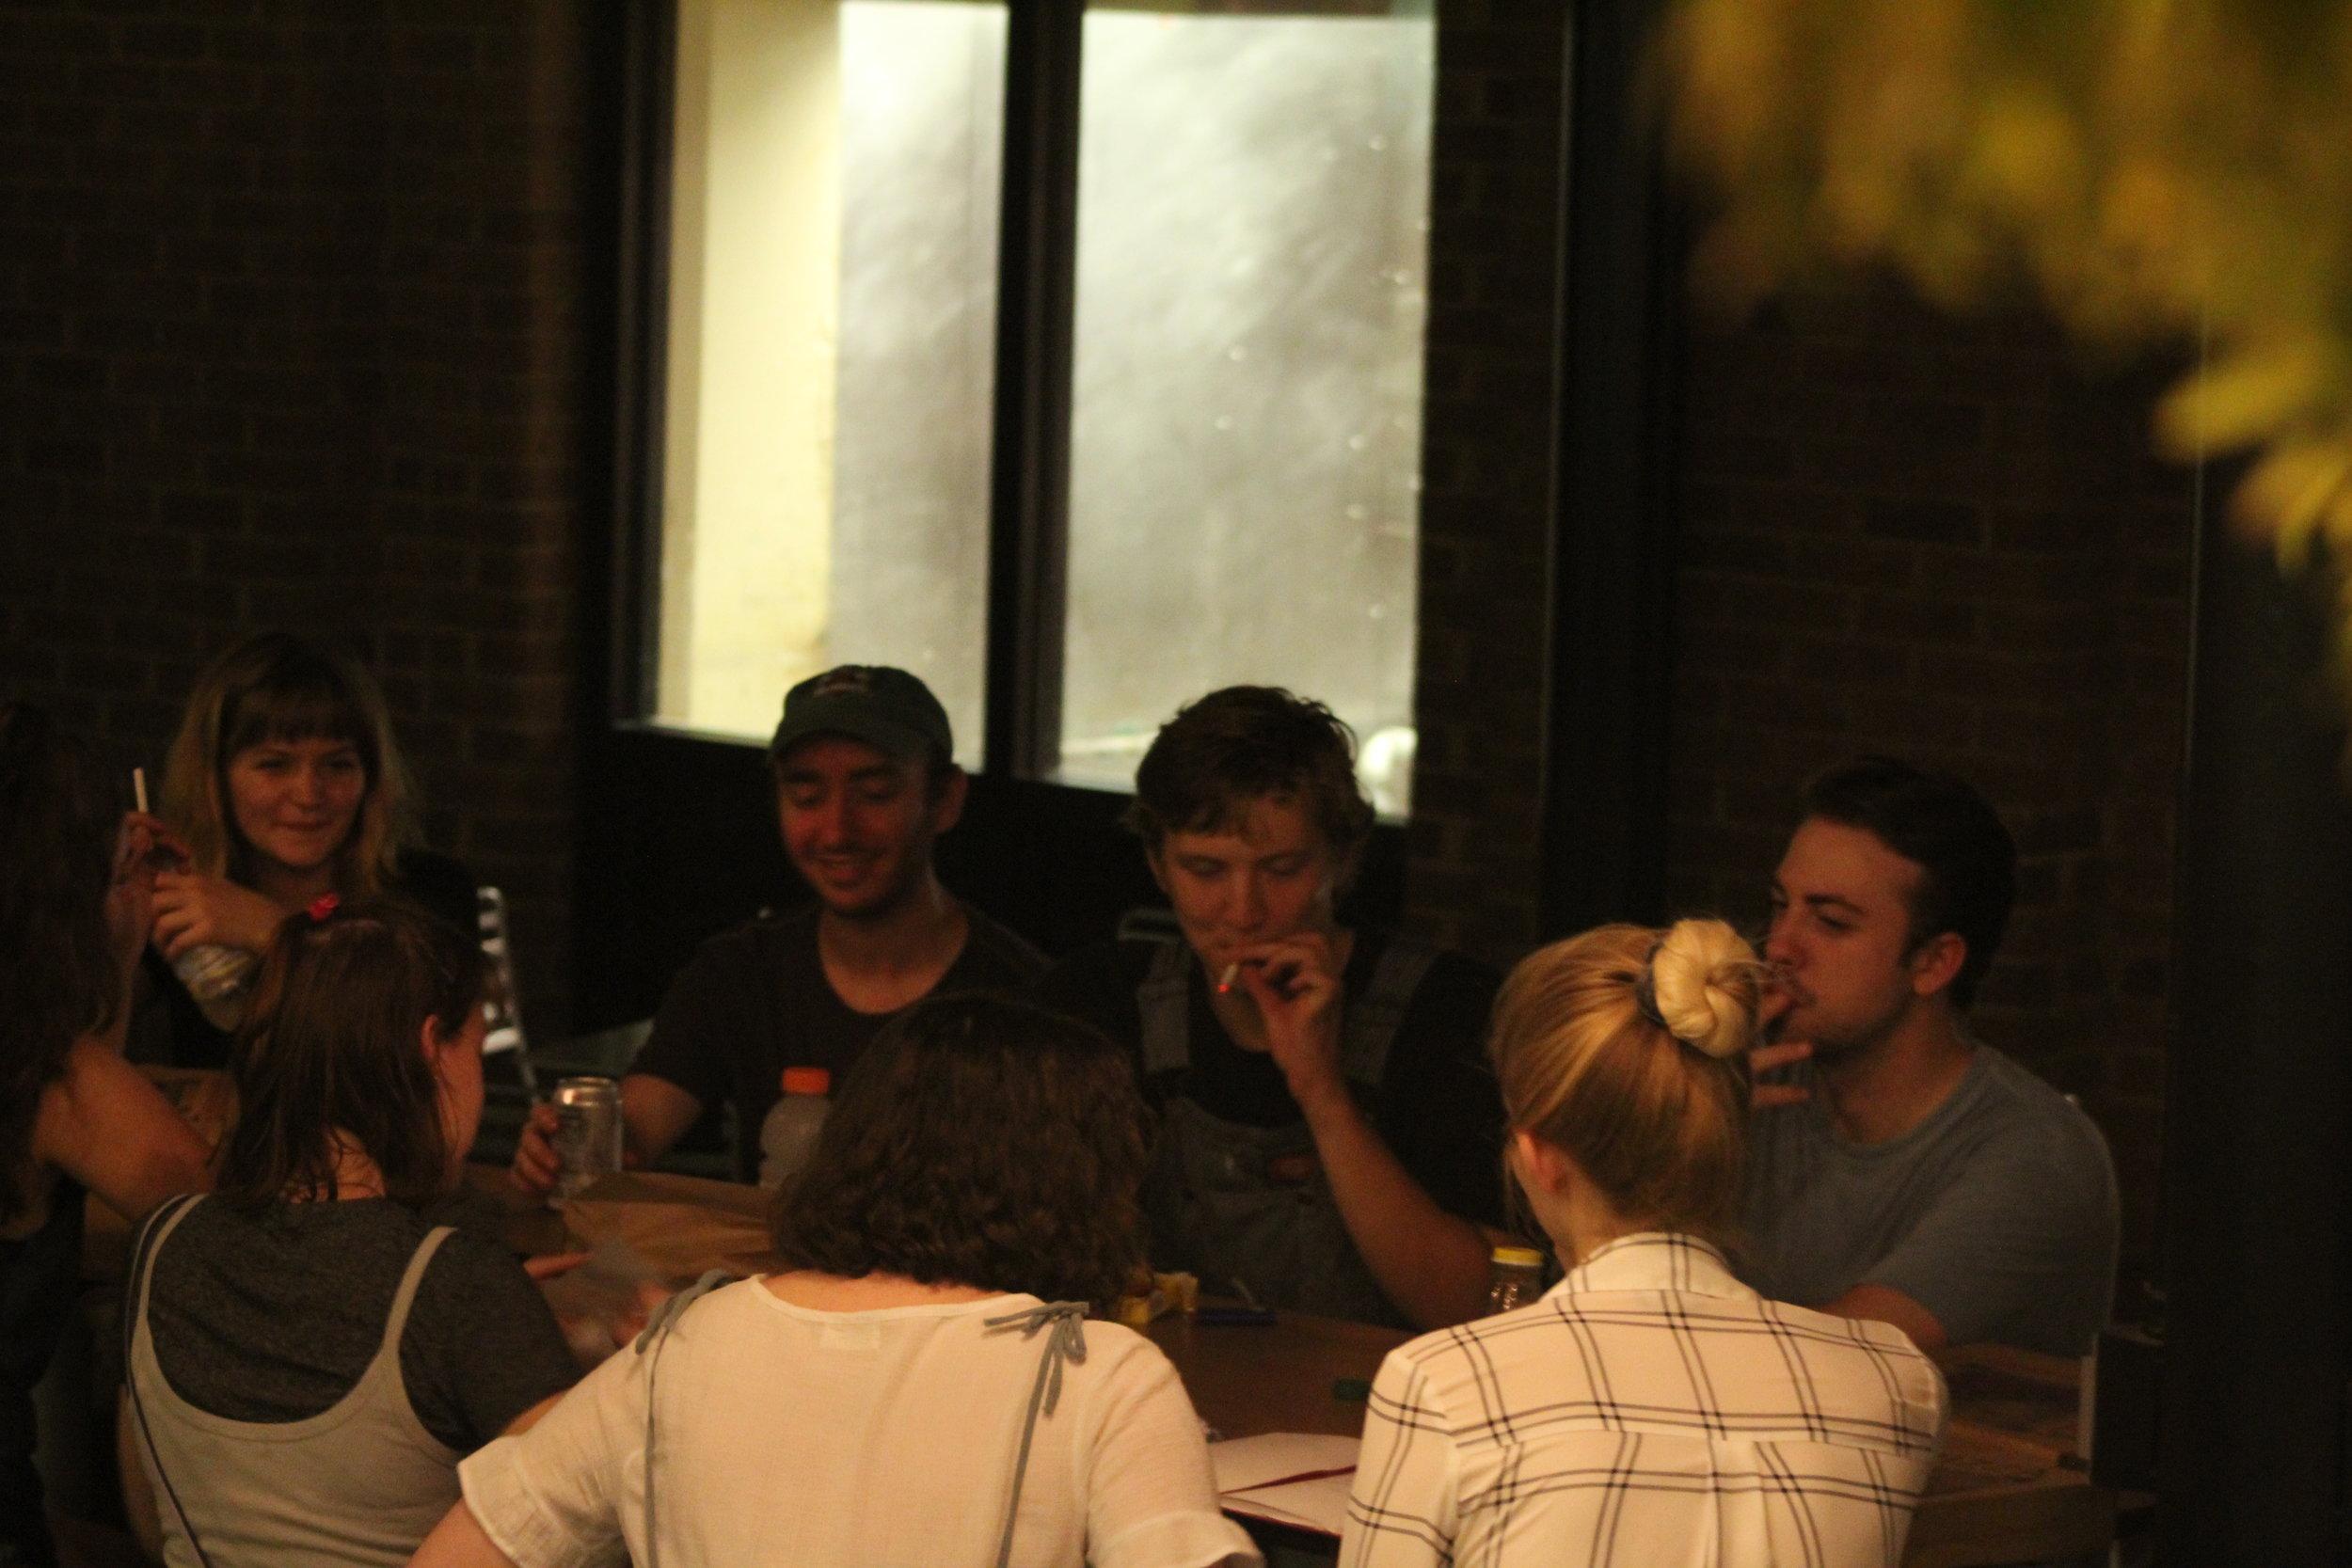 Back: Molly, Dan, Jackson, and Tim, Front: Minna Heaton, Emma, and Laighton Cain